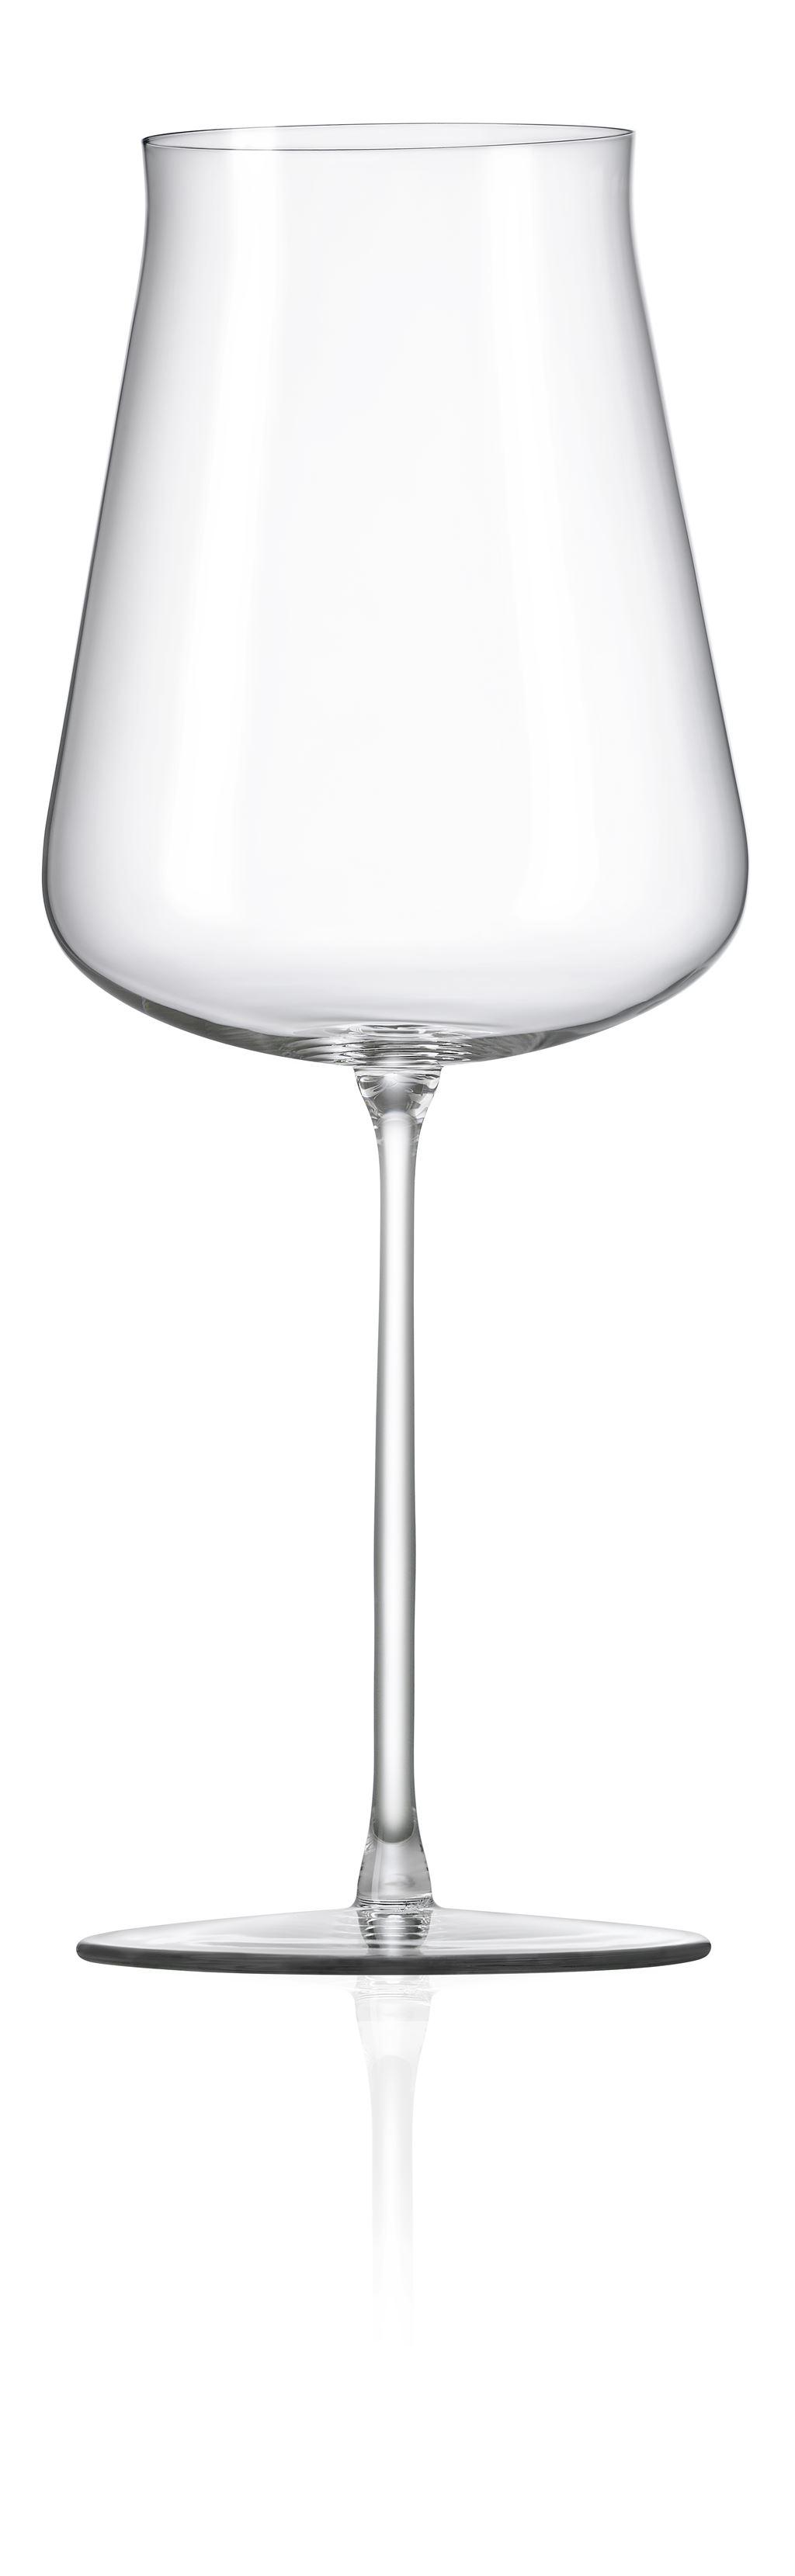 Polaris grt kelih 2/1 540 ml vino